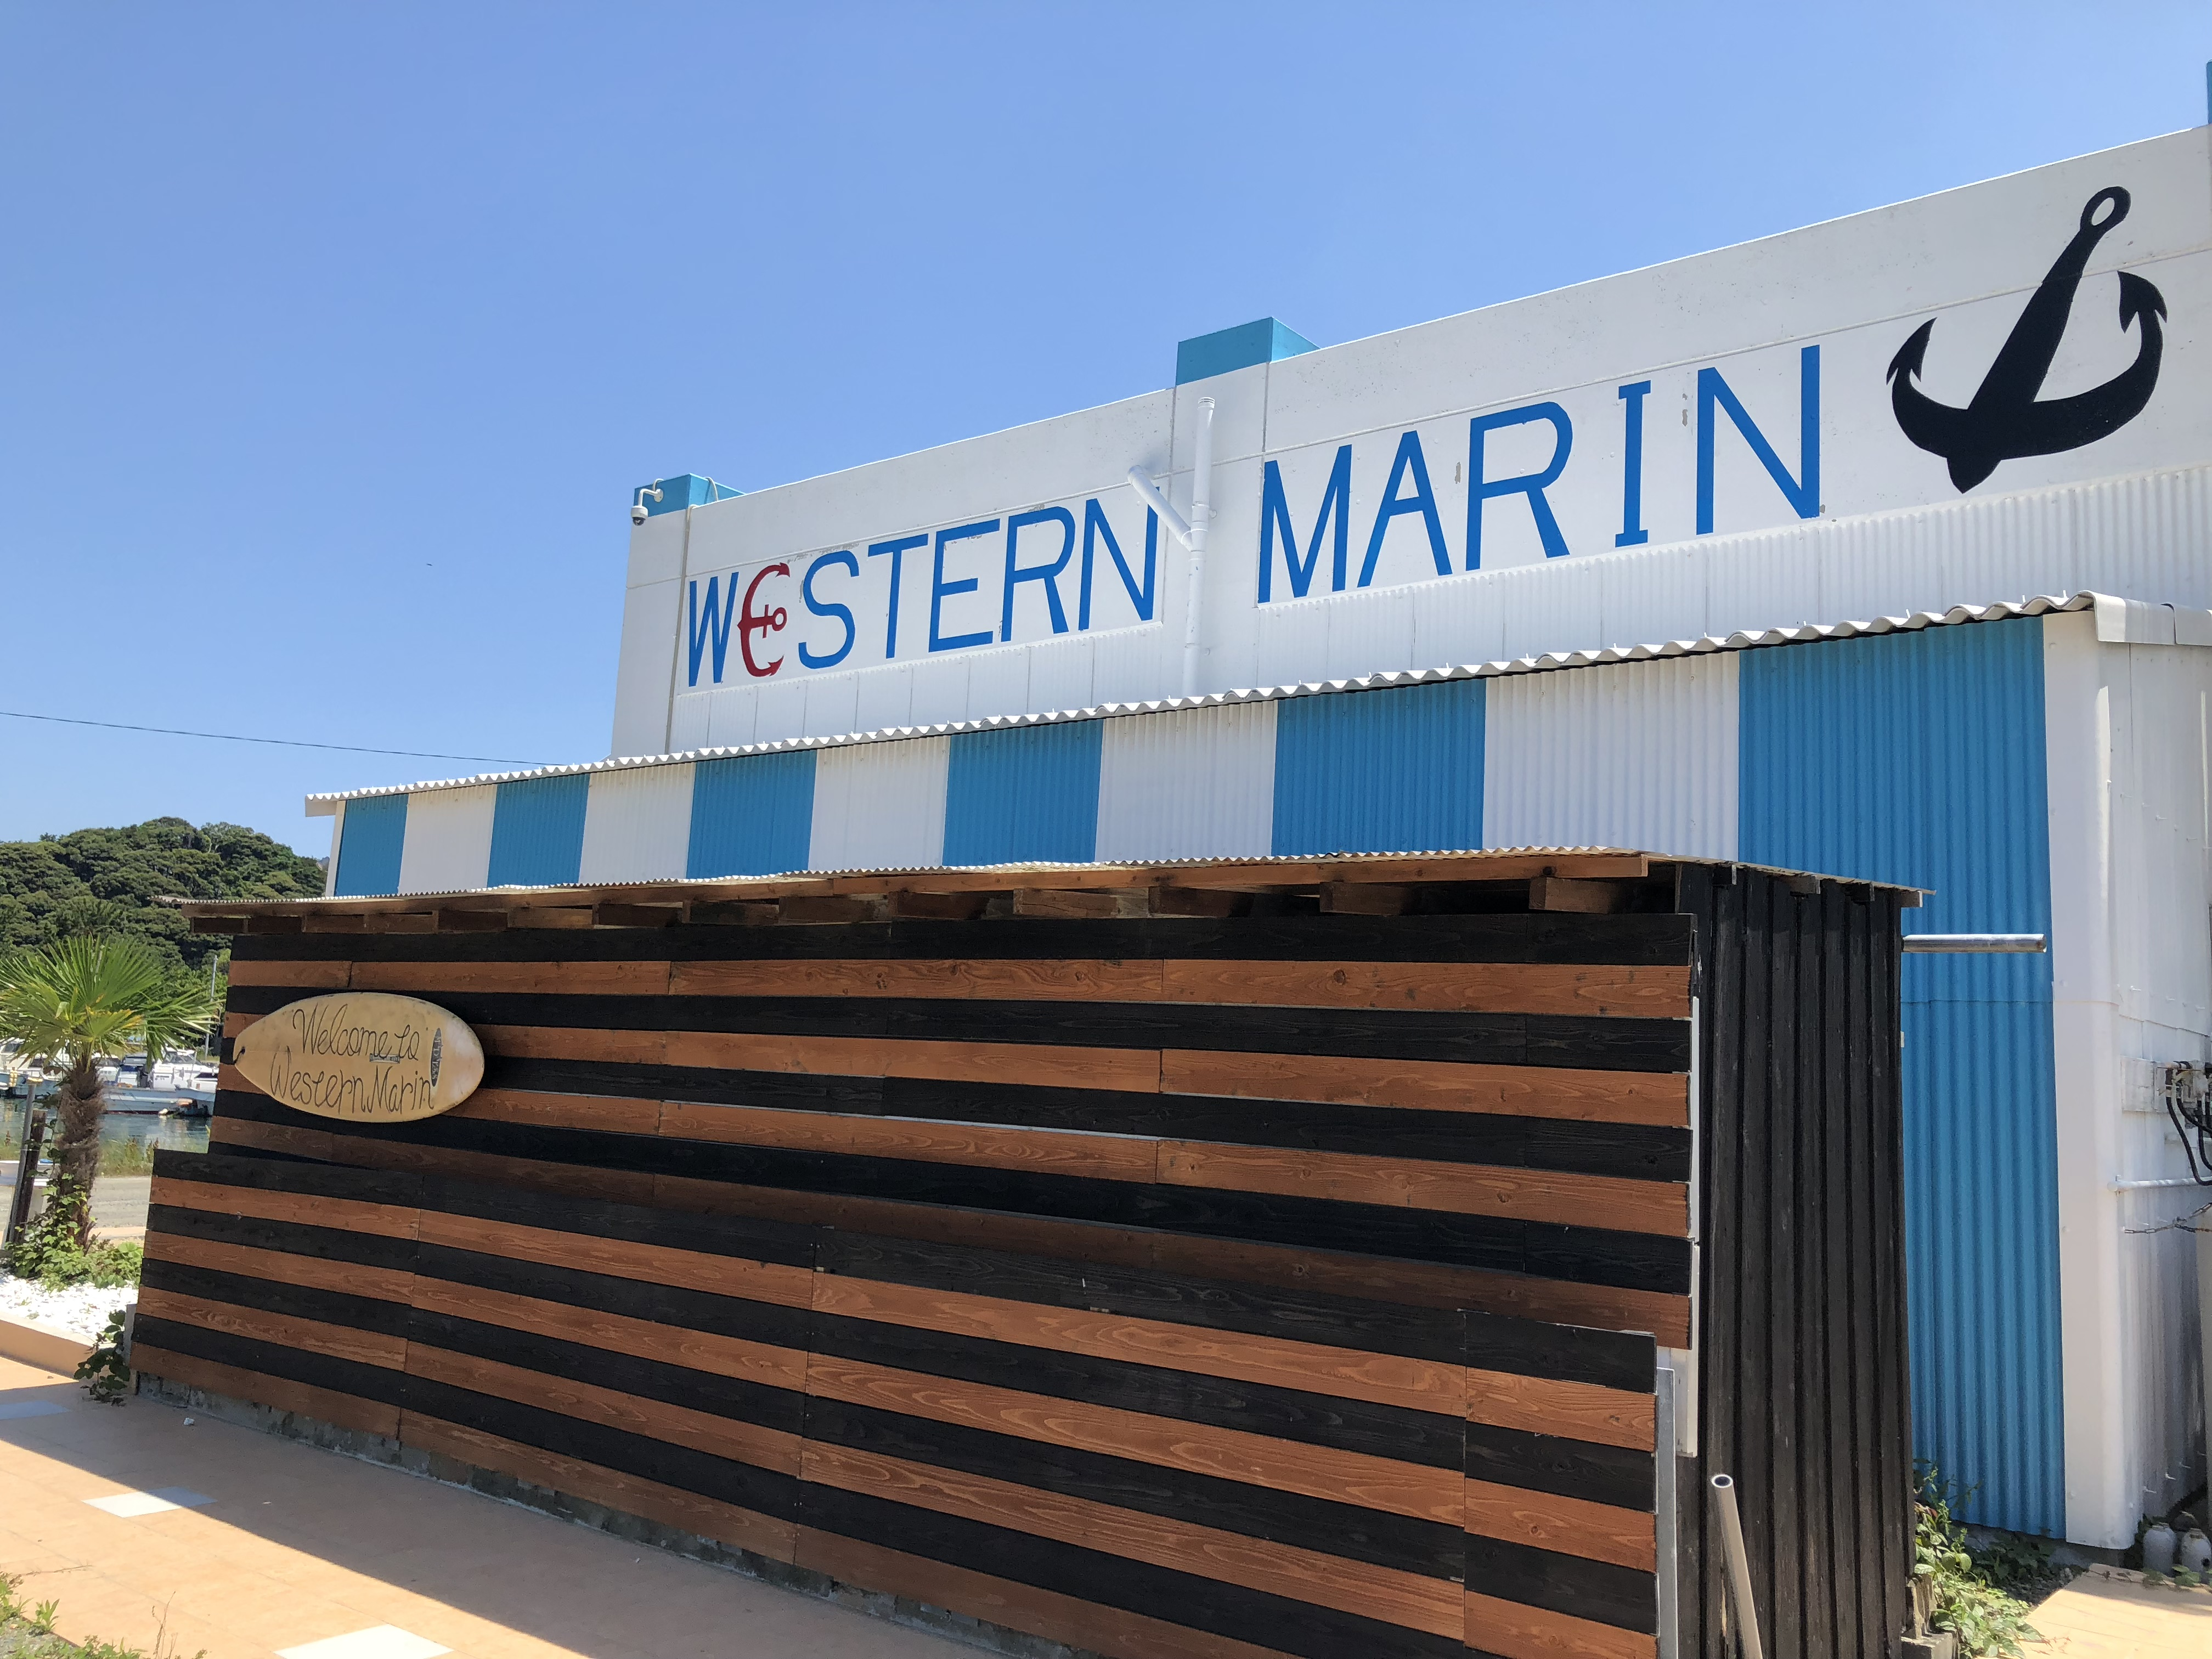 WESTERN MARIN 表